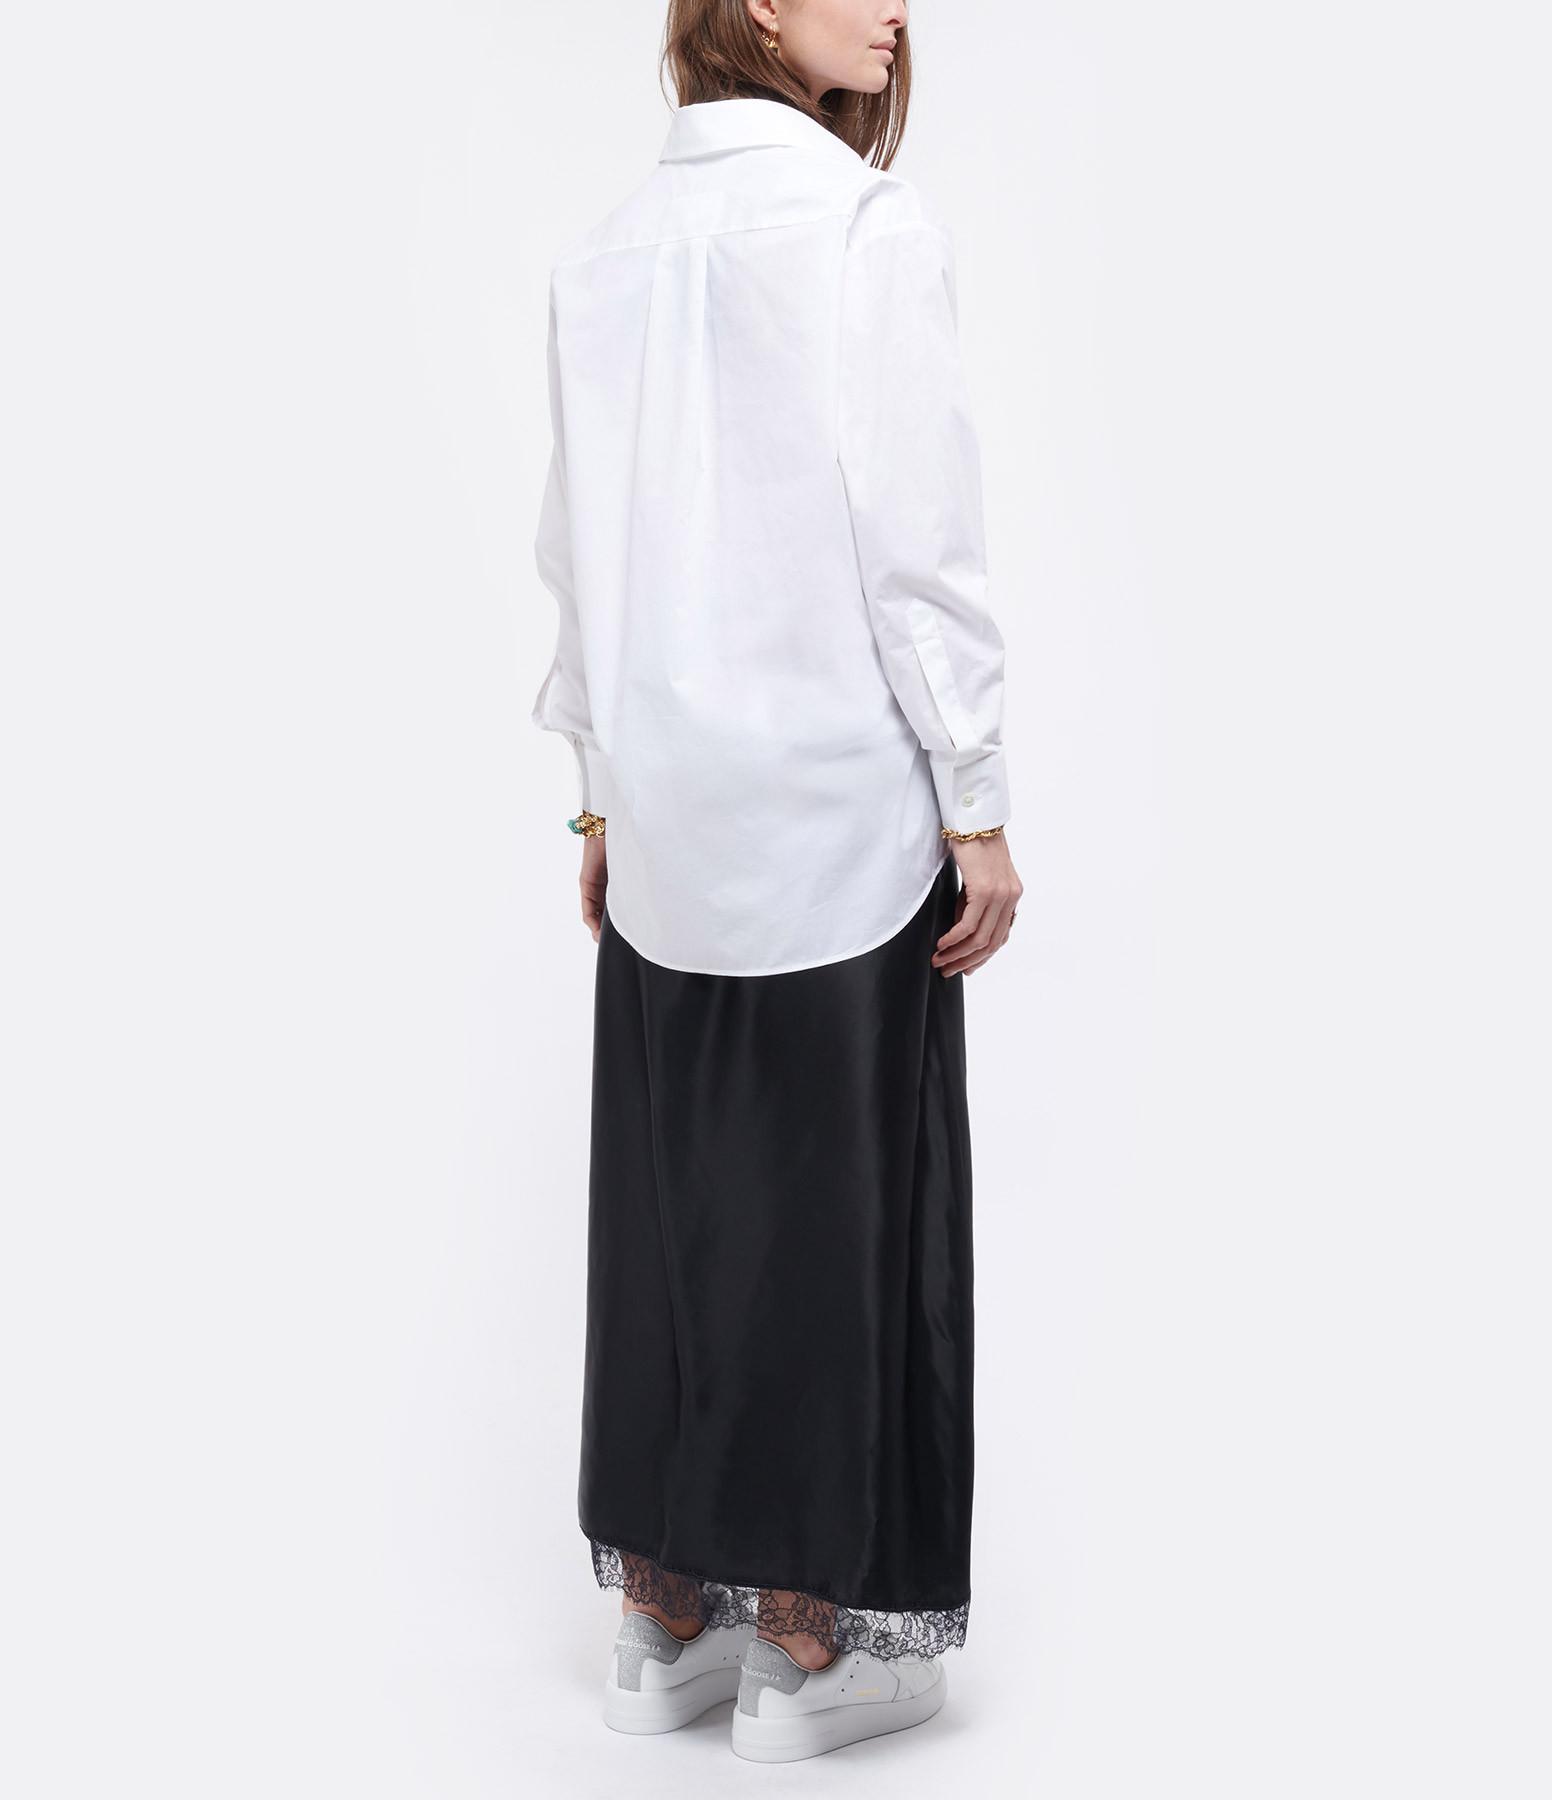 MM6 MAISON MARGIELA - Robe Coton Popeline Noir Blanc